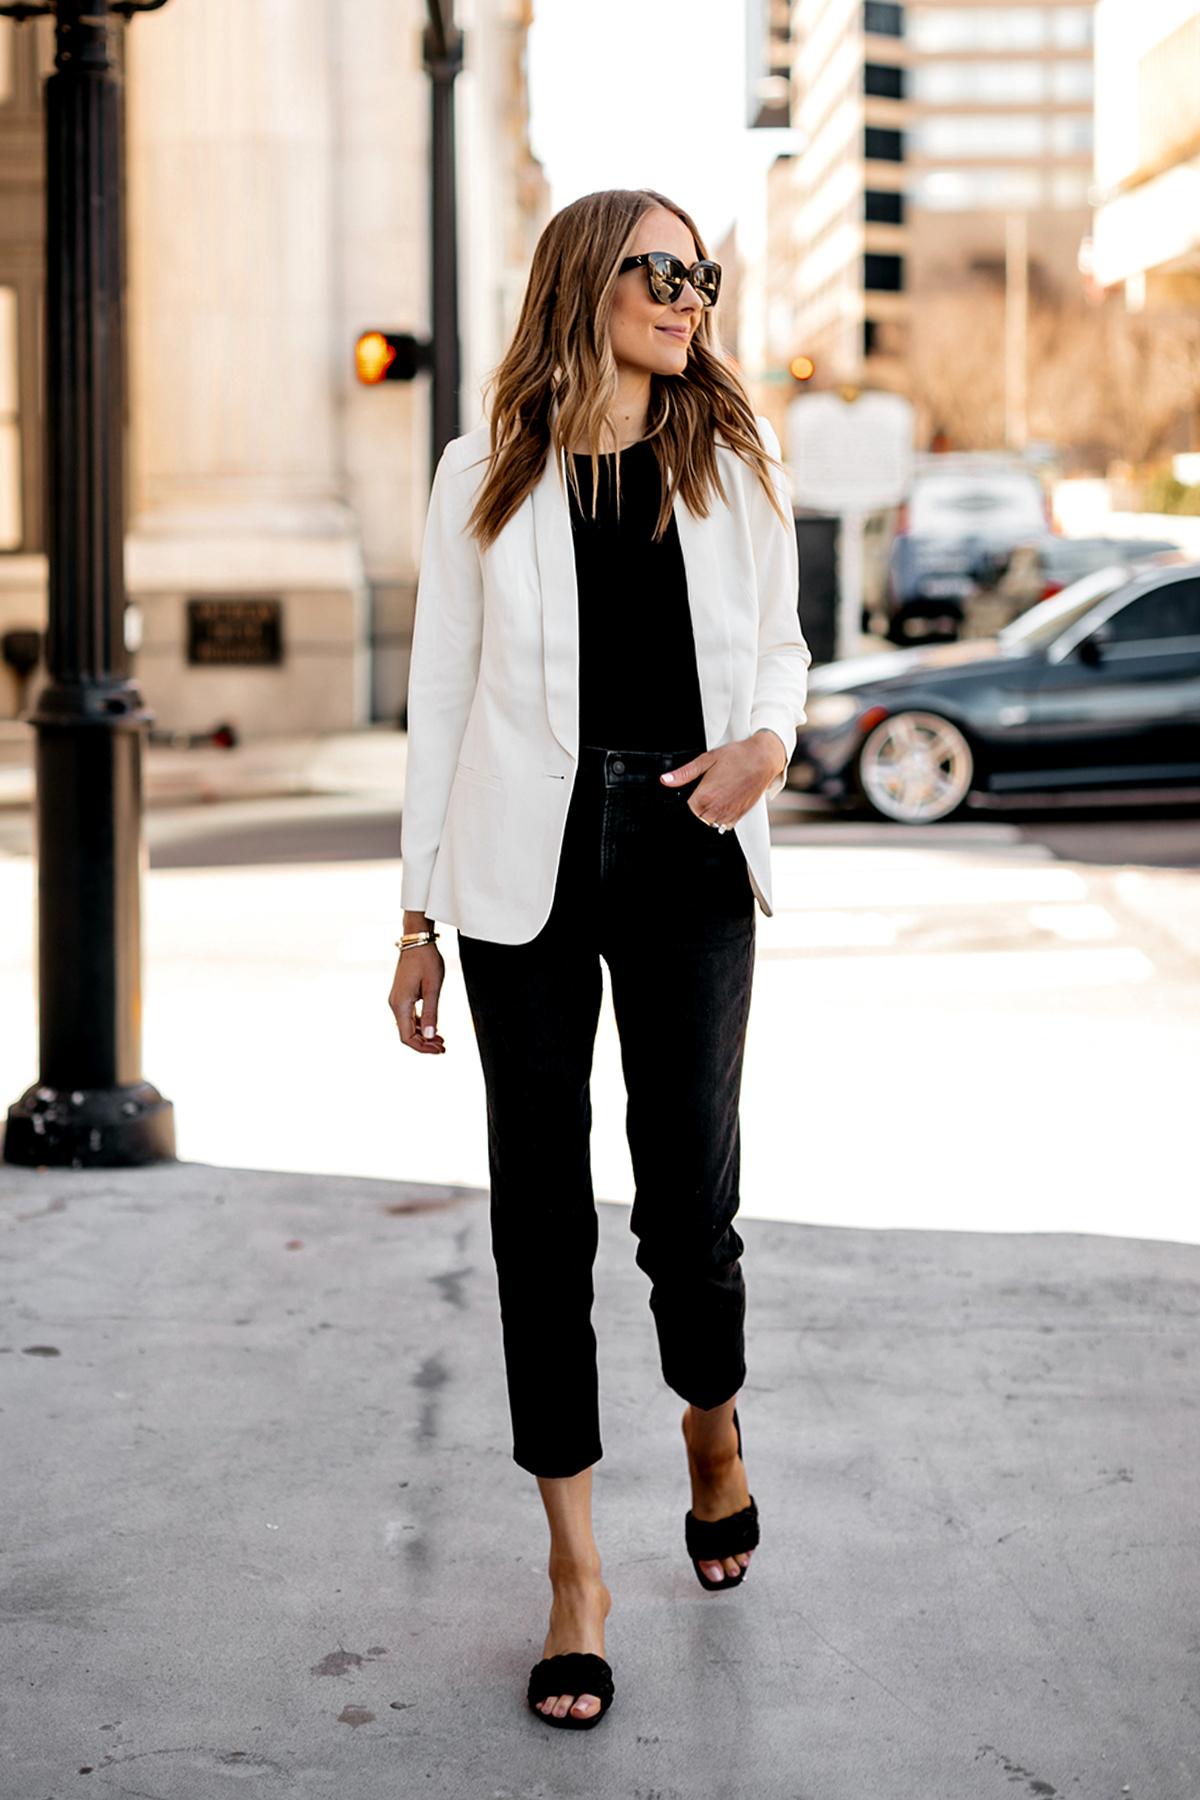 Fashion Jackson Wearing Express White Blazer Black Bodysuit Black Jeans Black Heeled Sandals Modern Workwear Outfit 2